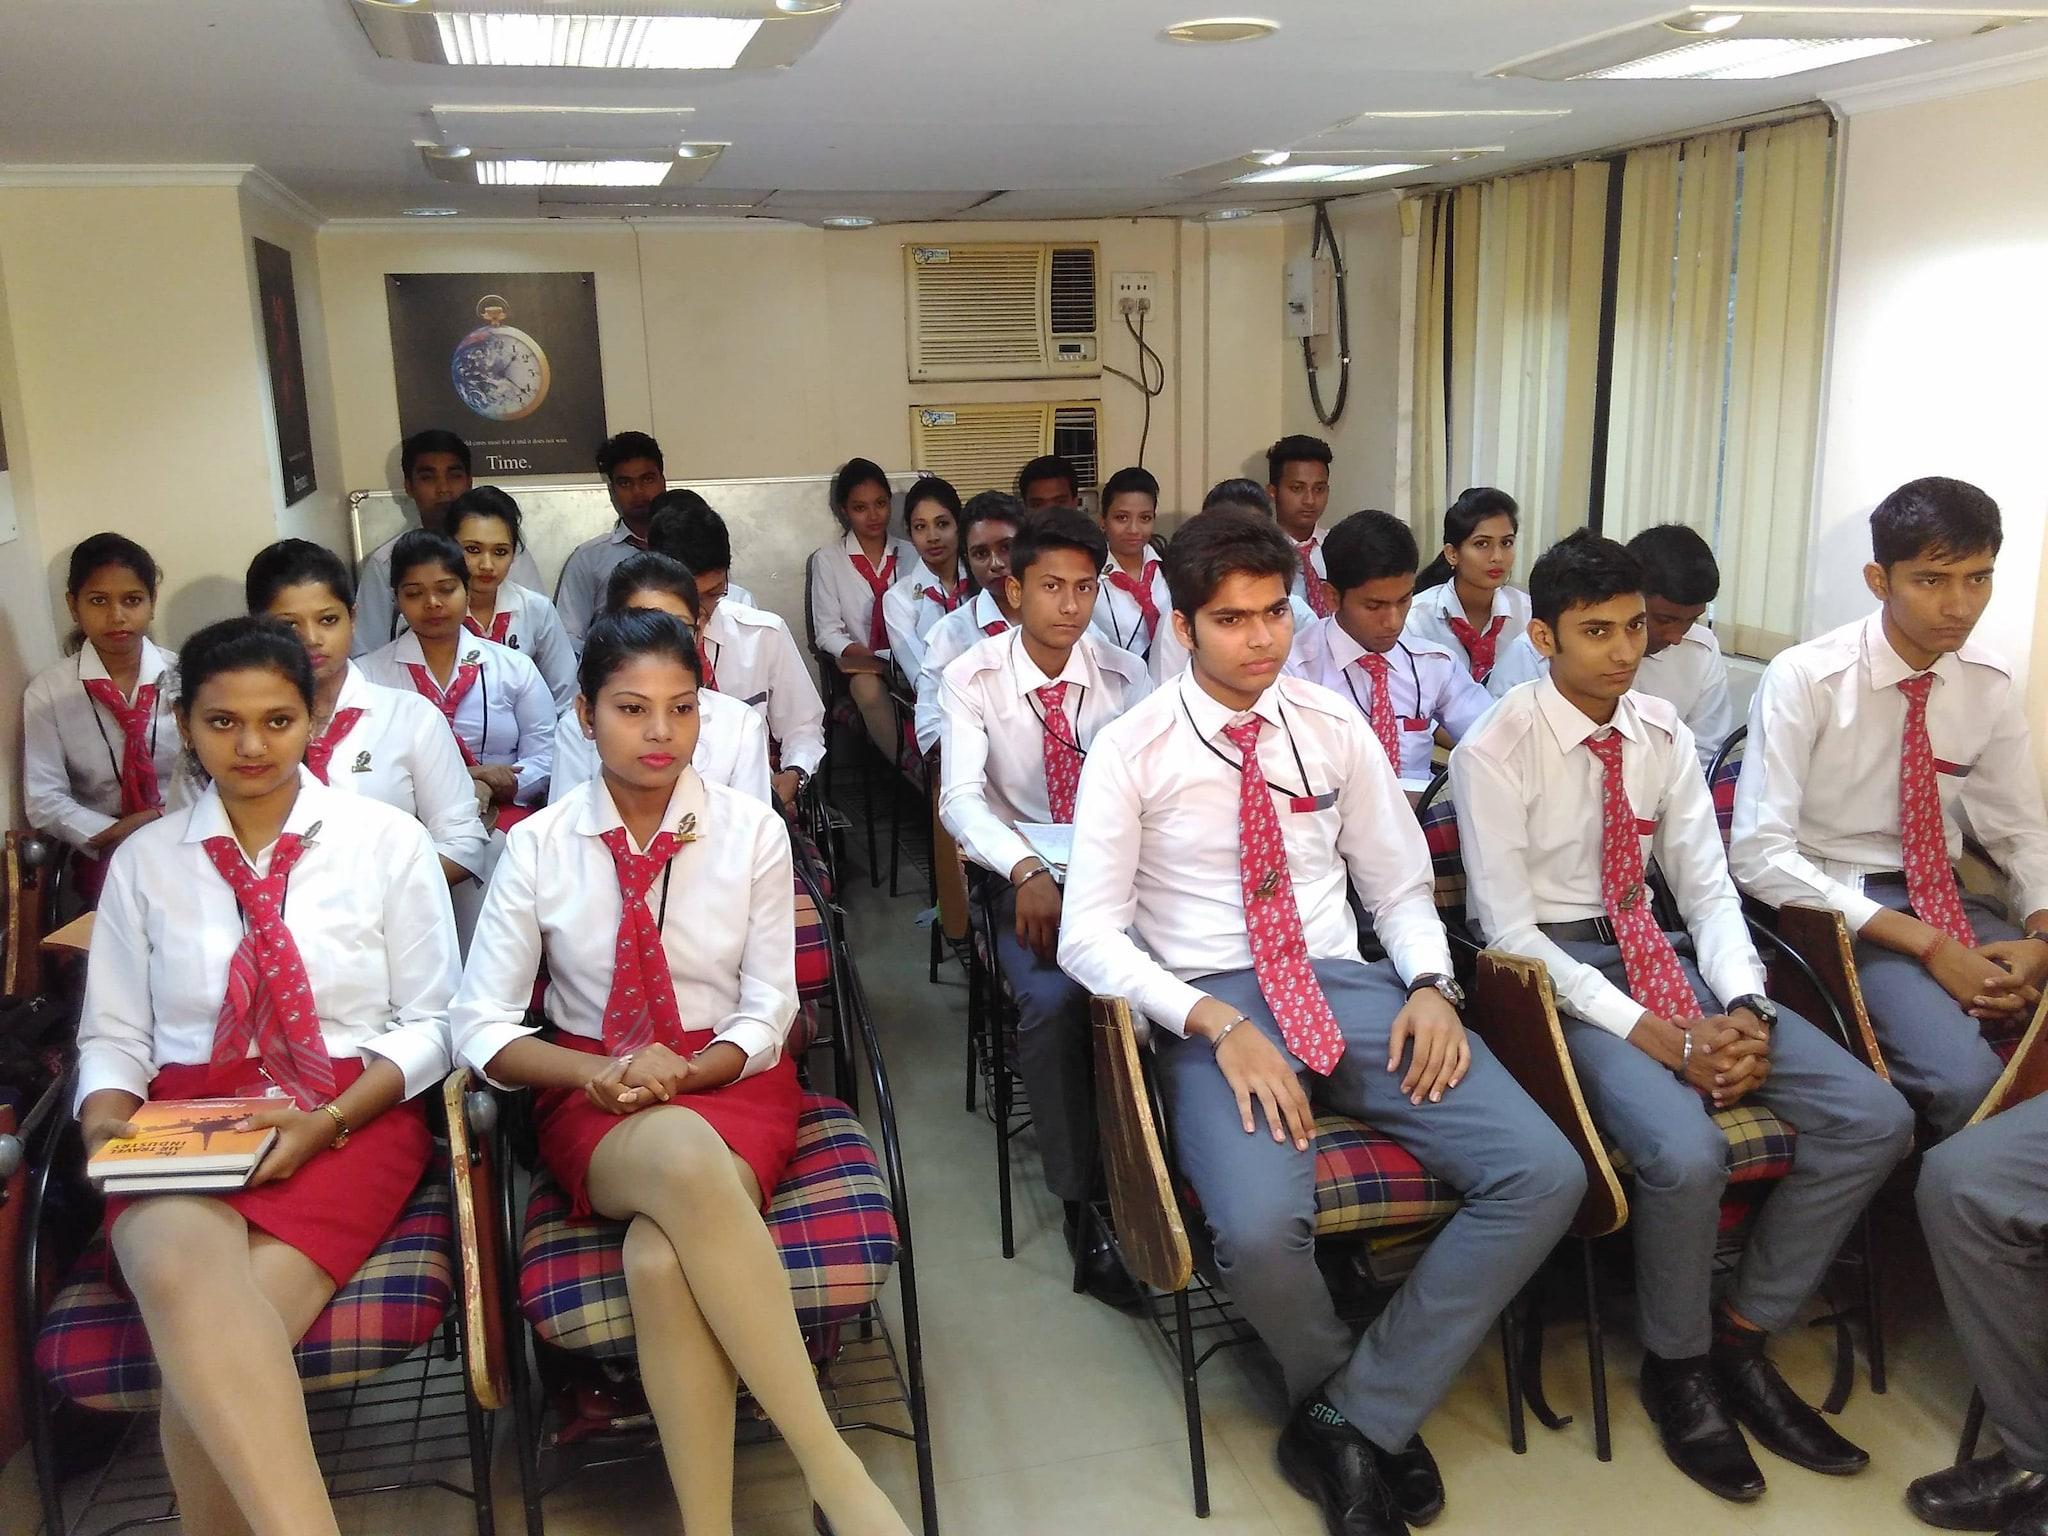 Top 50 Air Hostess Training Institutes in Kolkata - Best Air